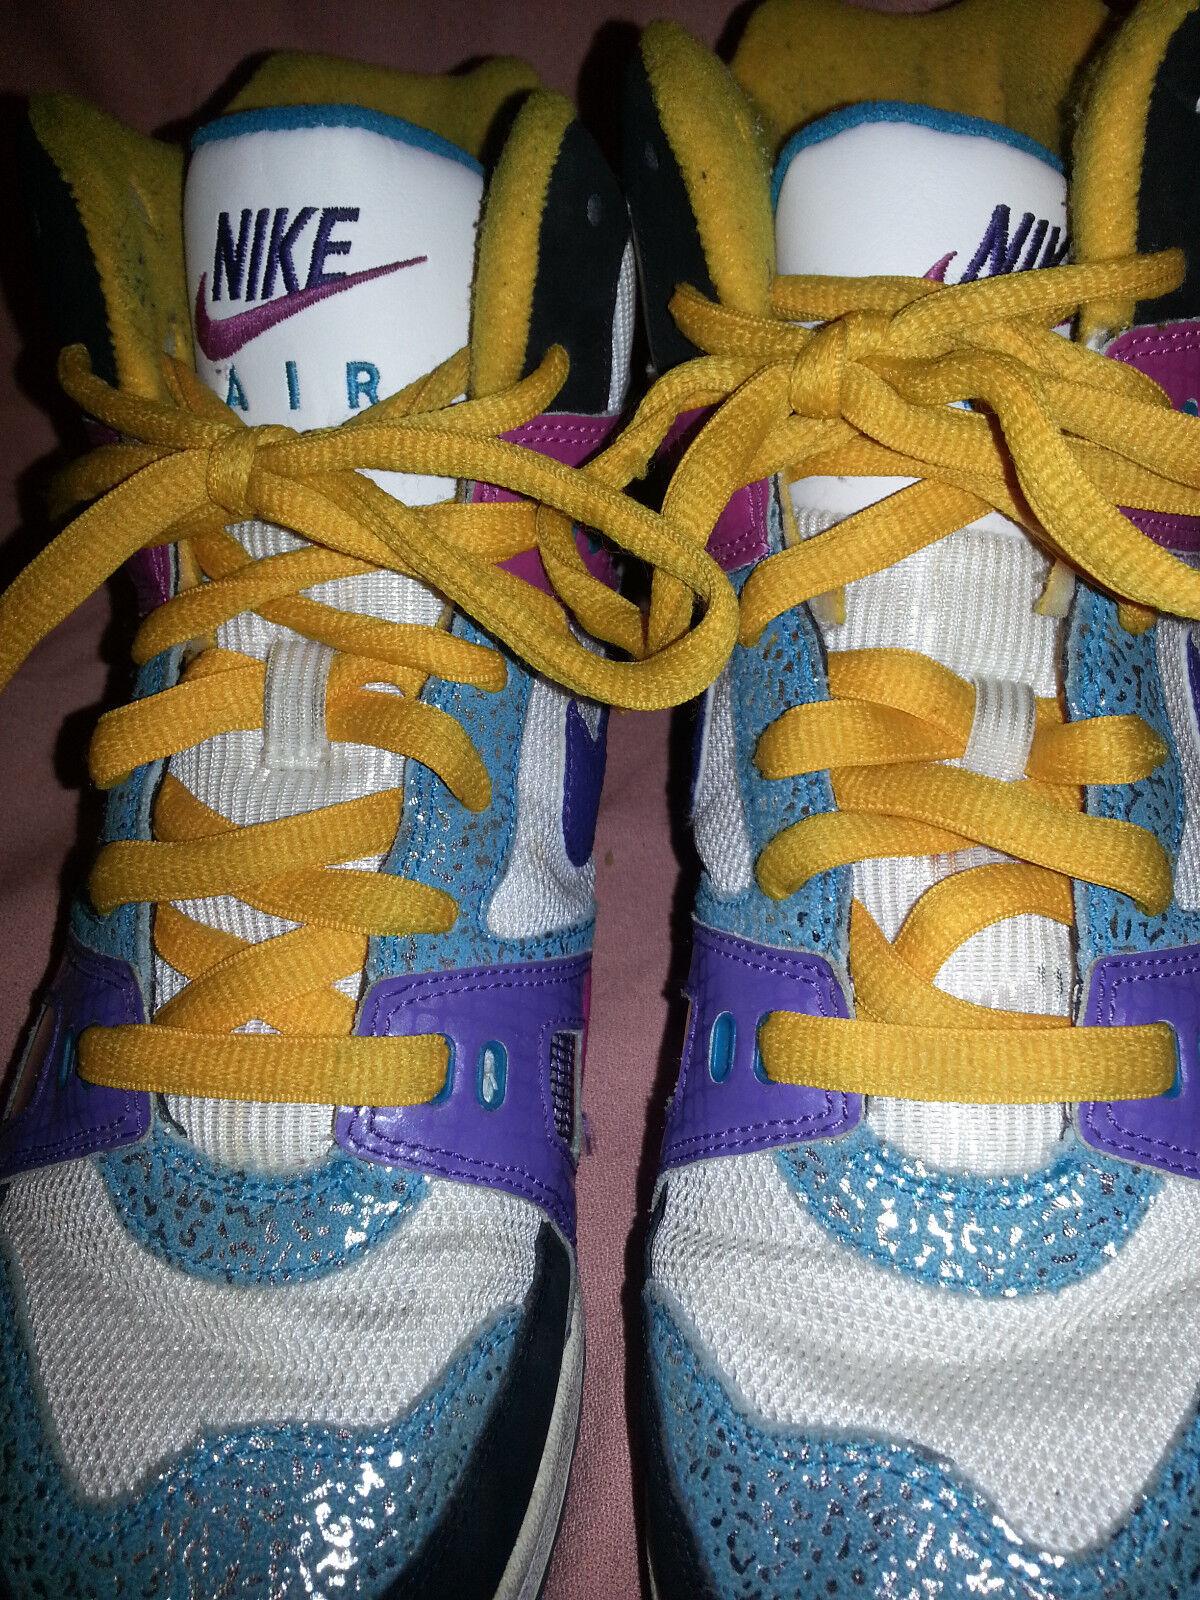 Nike Top Air High Top Nike Mans zapatos Talla 11 4e6624